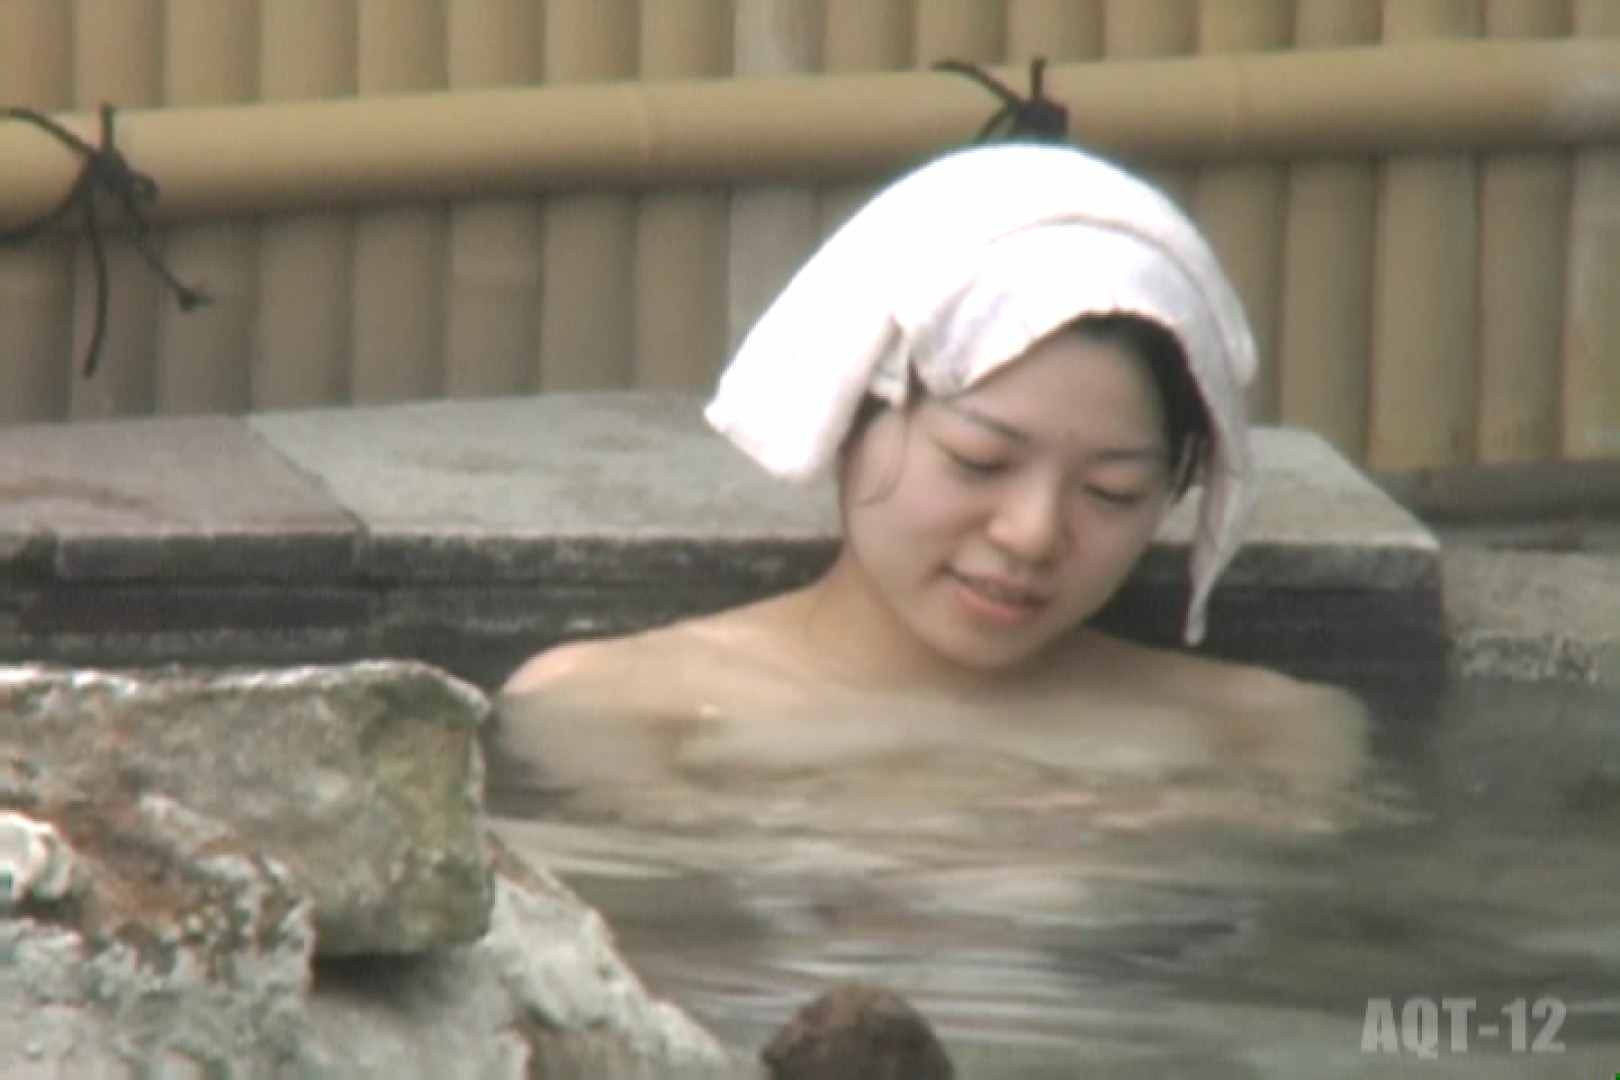 Aquaな露天風呂Vol.810 露天風呂編 | 盗撮シリーズ  108PIX 105